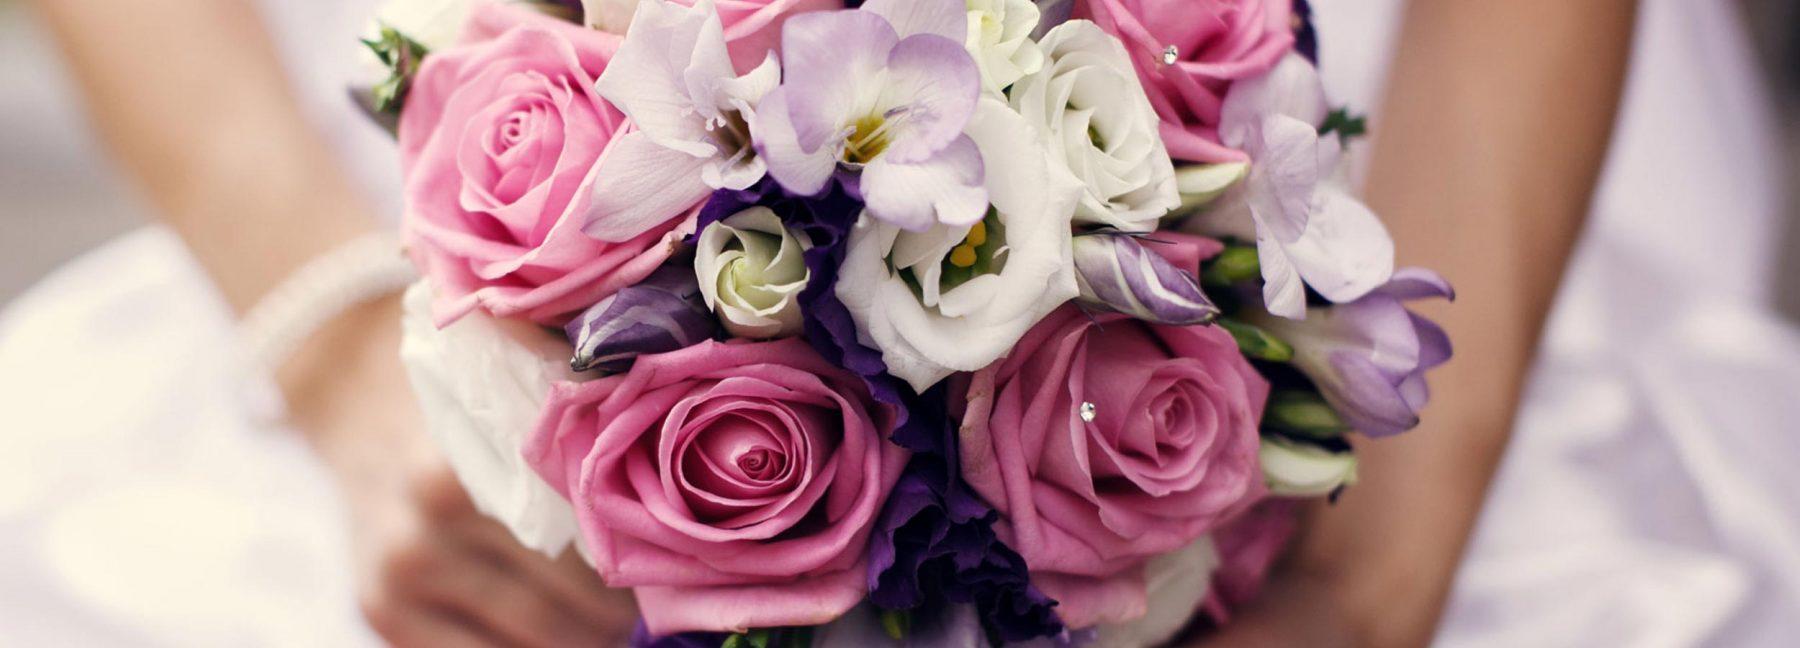 banner-bouquet